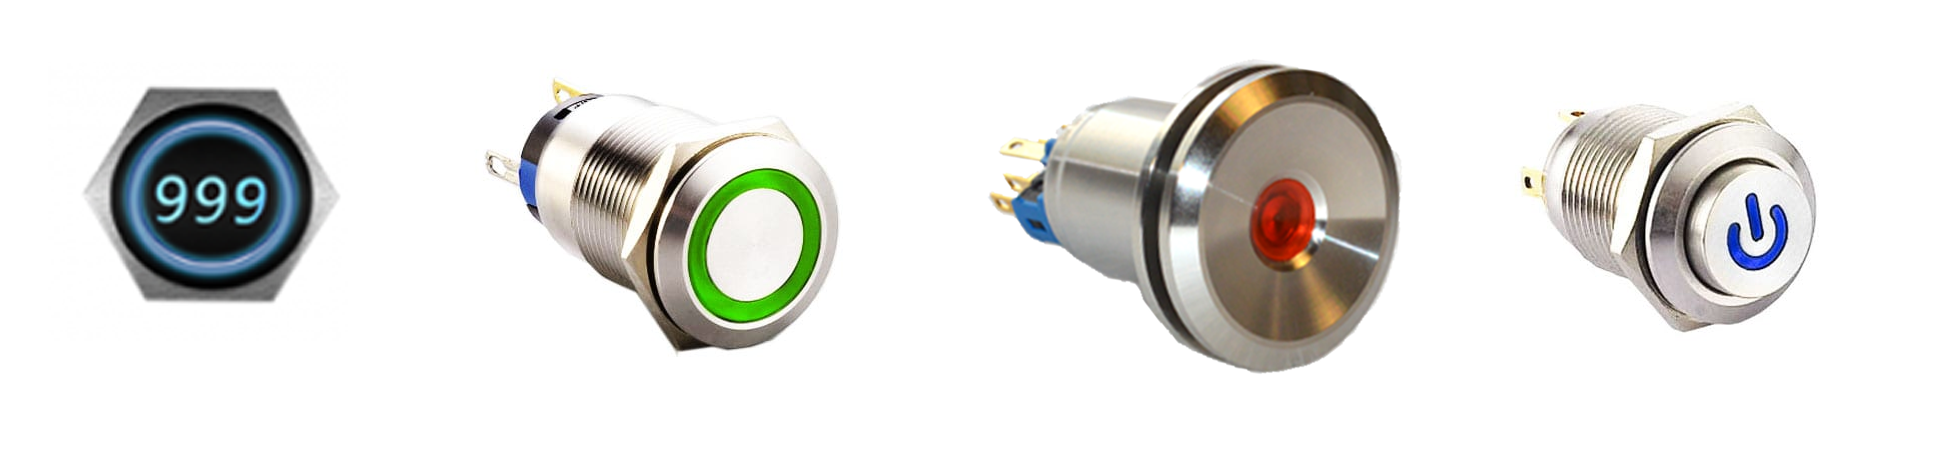 LED illumination options, RJS Electronics Ltd.